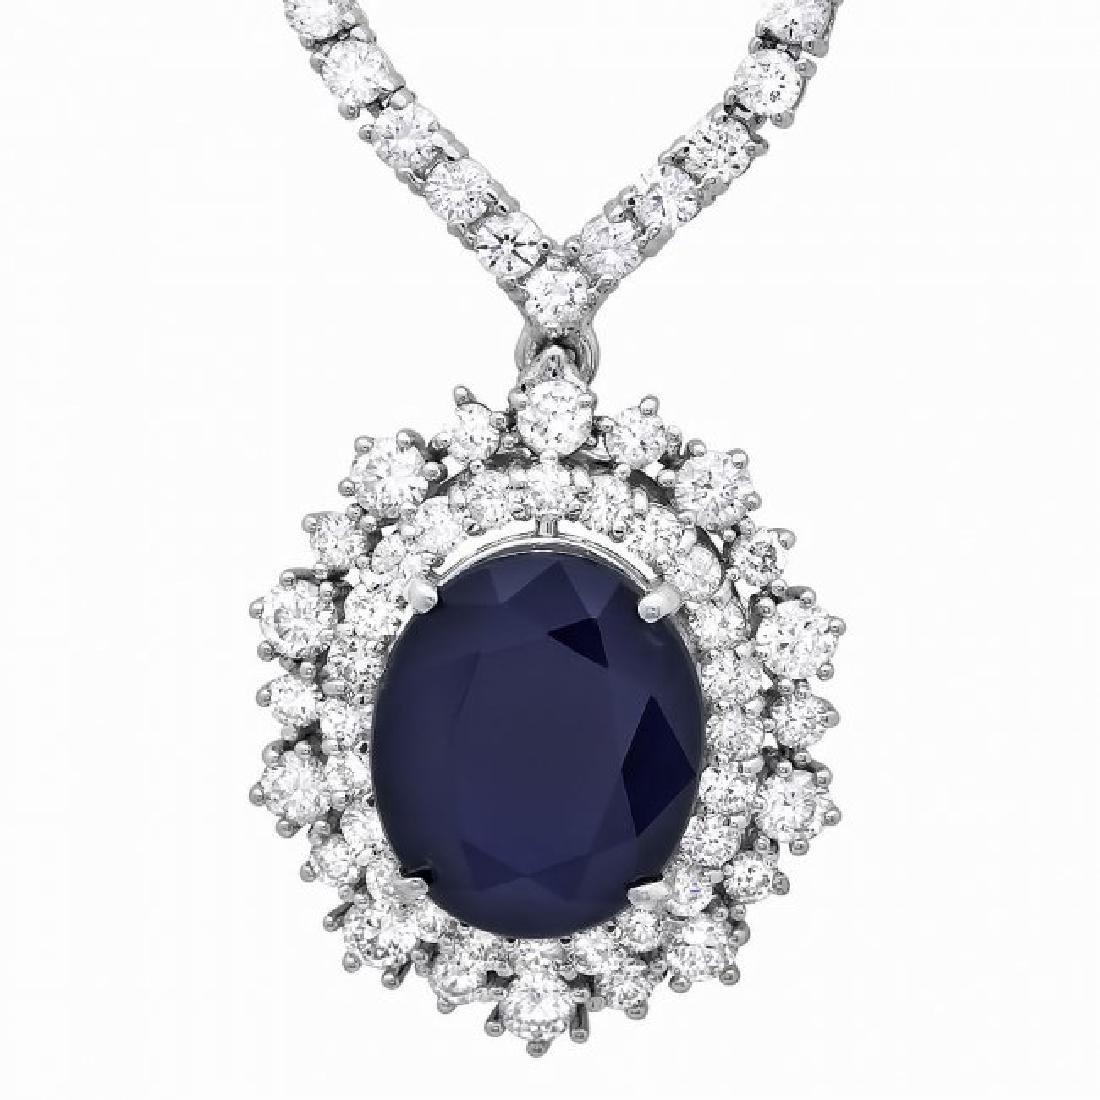 18k Gold 6ct Sapphire 5.00ct Diamond Necklace - 3